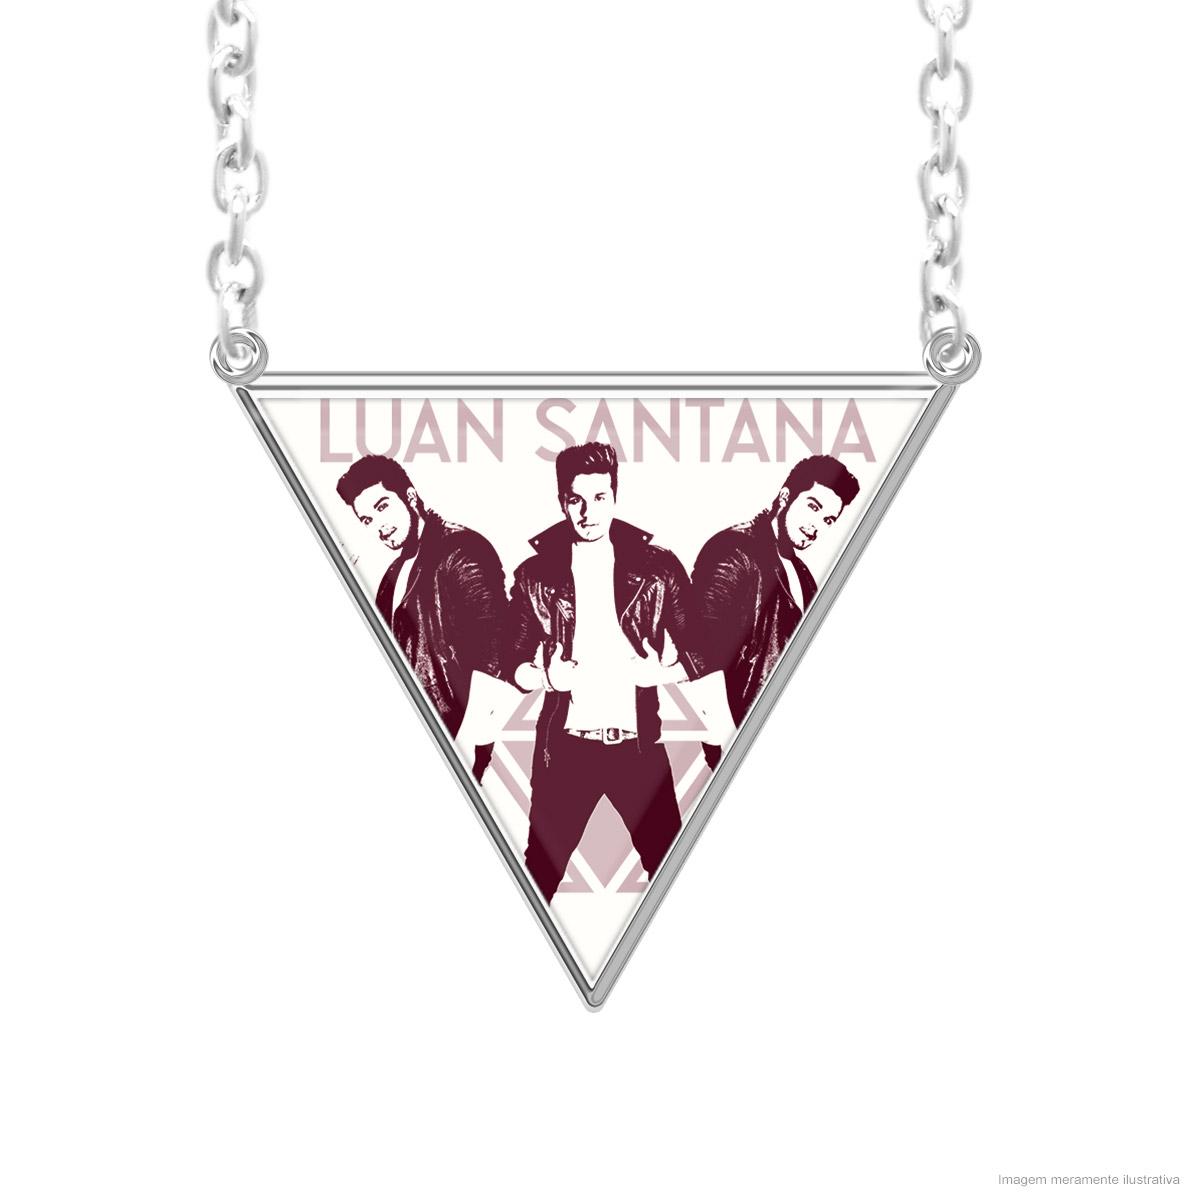 Colar Prata Luan Santana Triângulo Foto